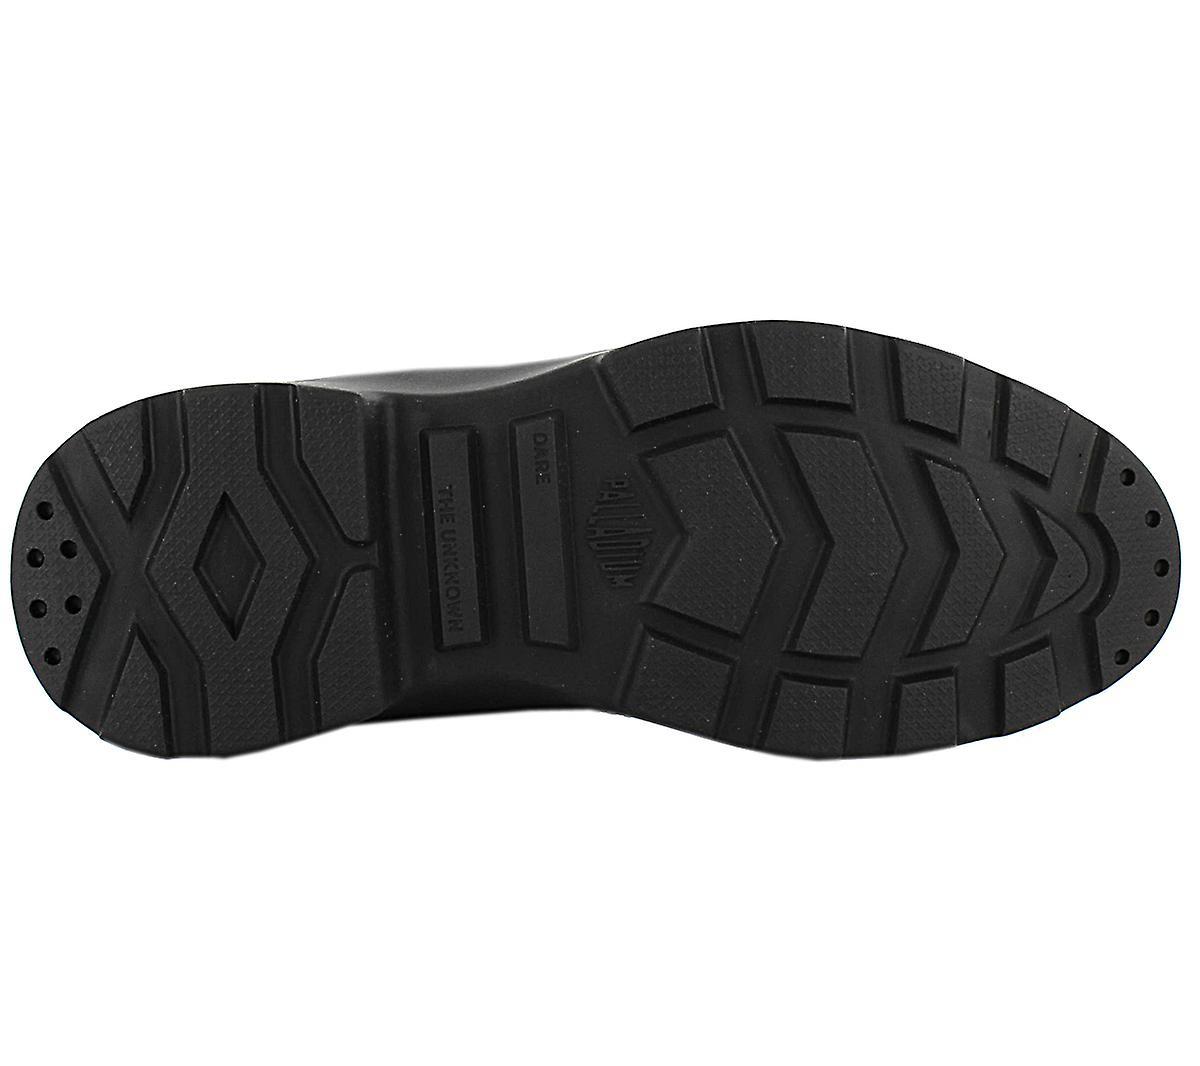 Palladium Pallakix 90 SK 76423-008-M Damen Boots Schwarz Sneakers Sportschuhe oHHOd